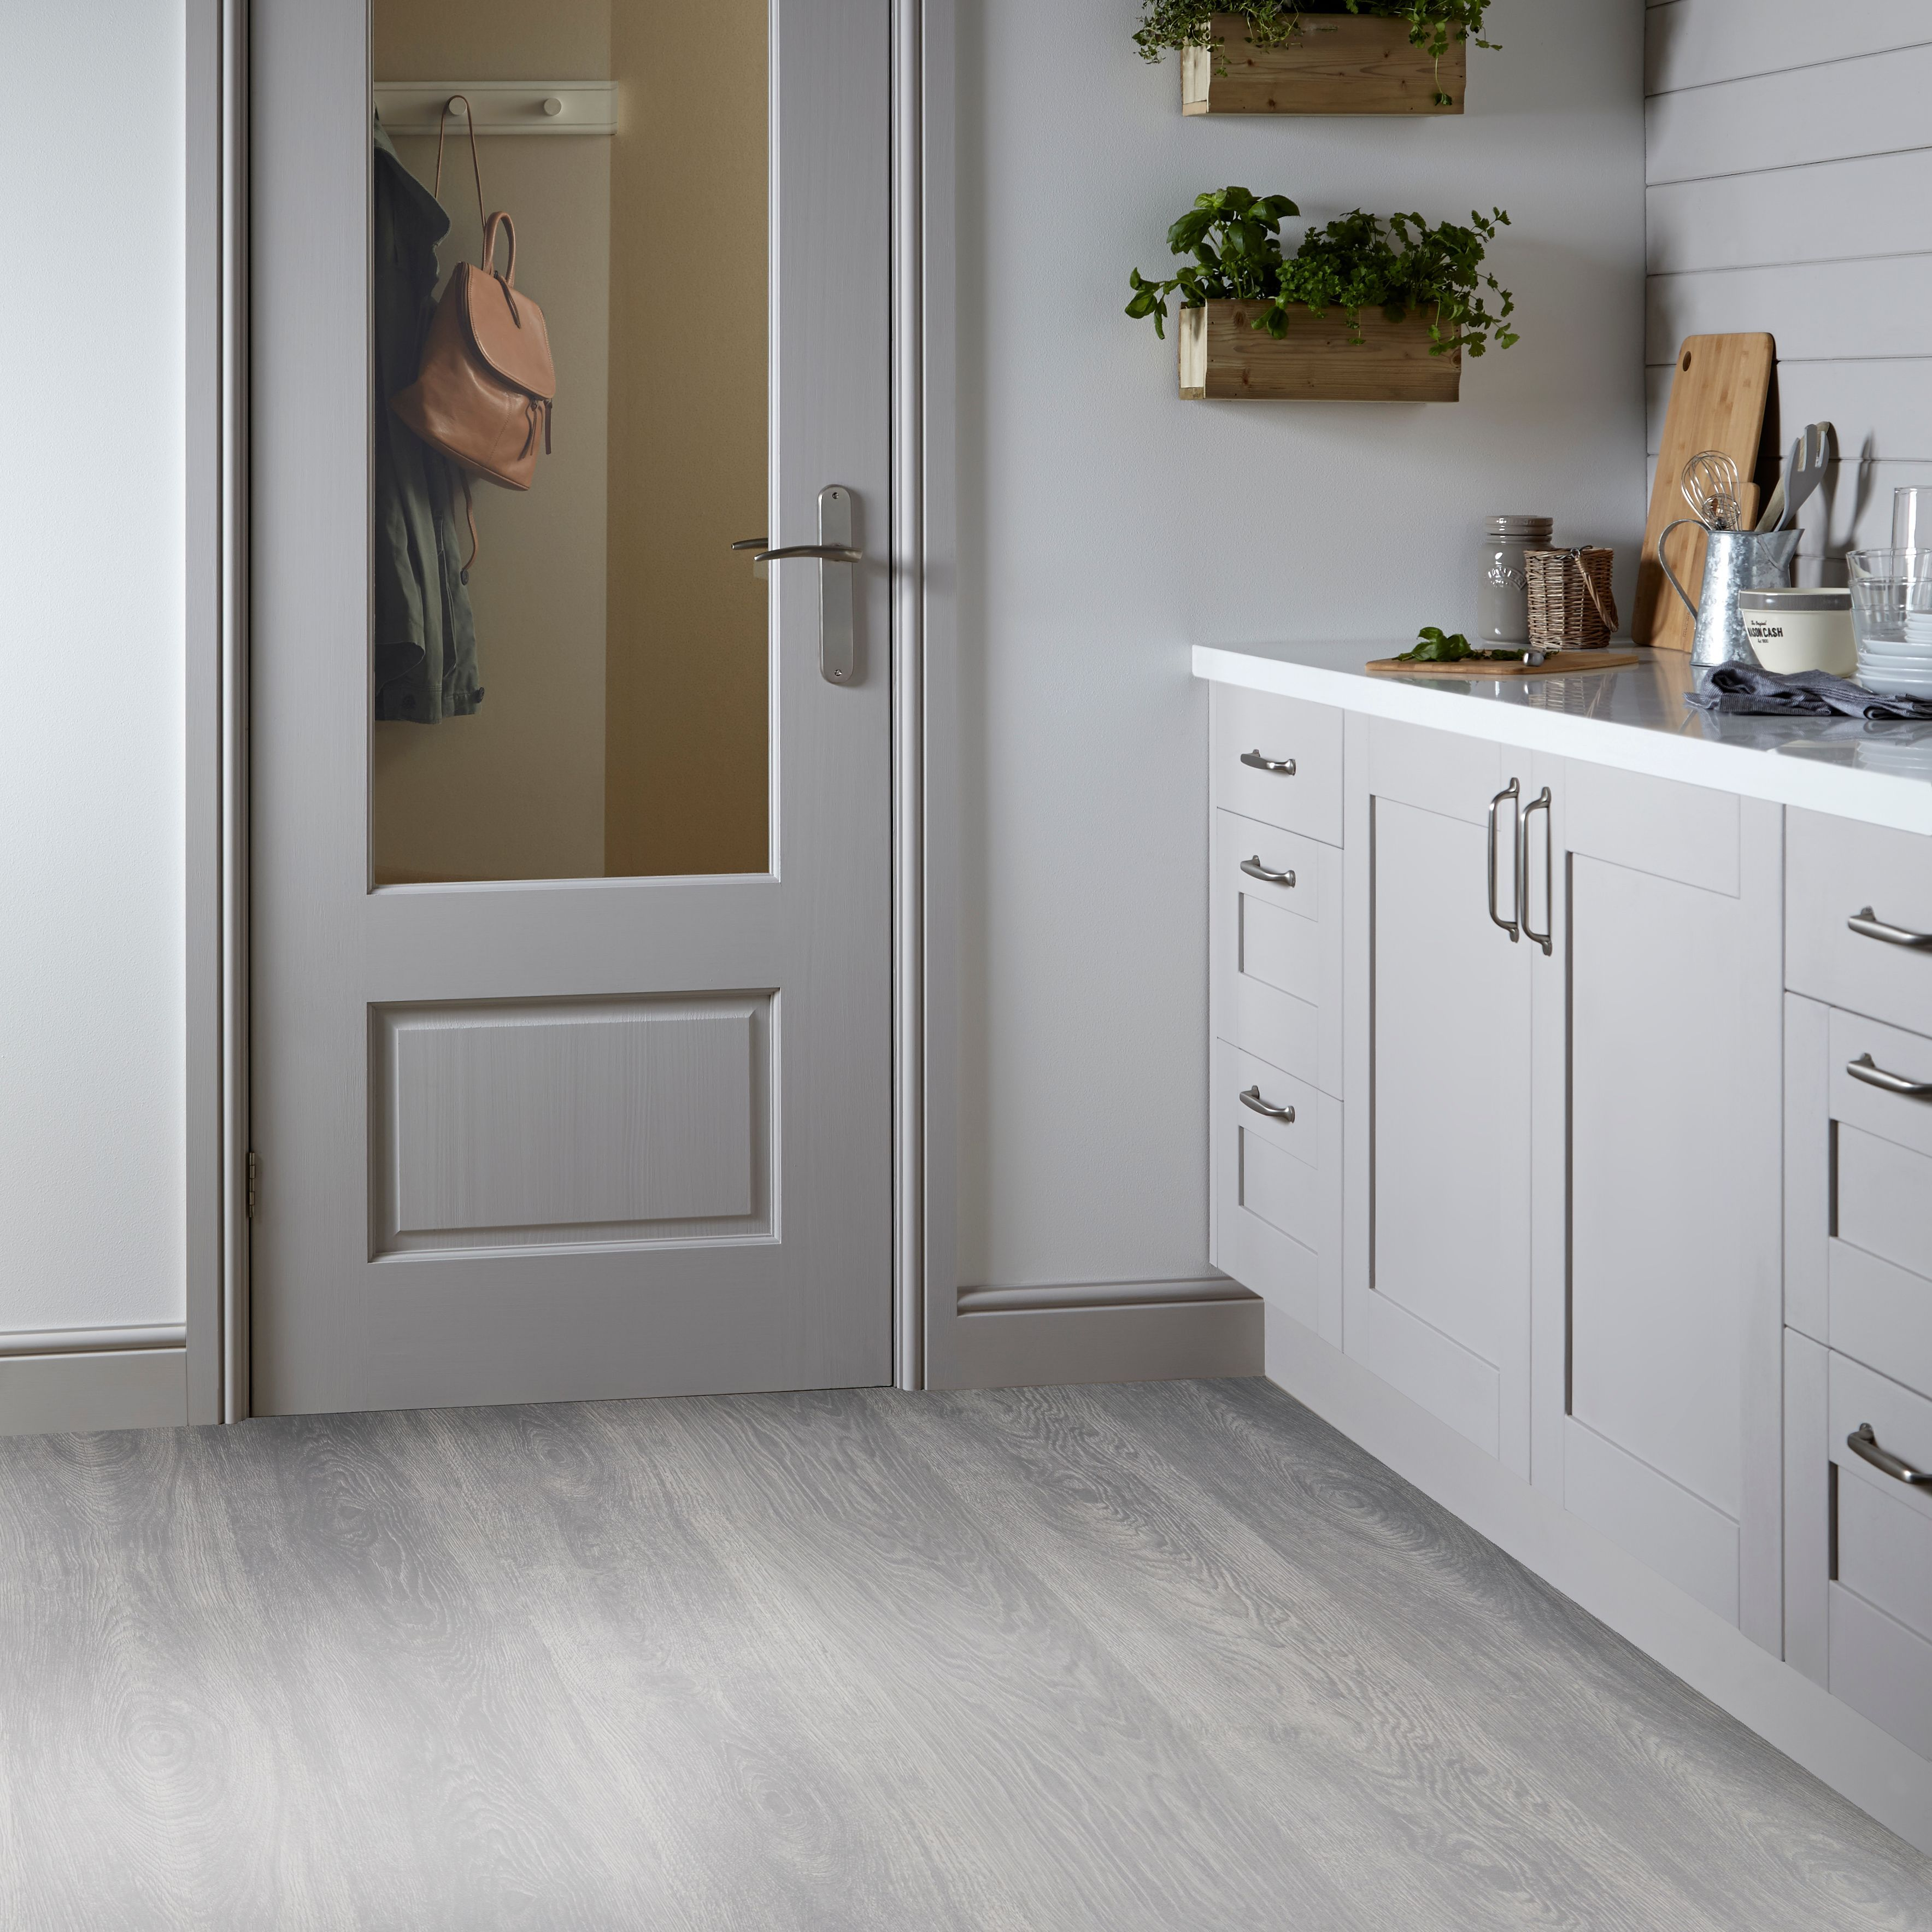 Isalenia whitewood effect matt vinyl flooring 6 m white vinyl isalenia whitewood effect matt vinyl flooring 6 m departments diy at bq dailygadgetfo Choice Image